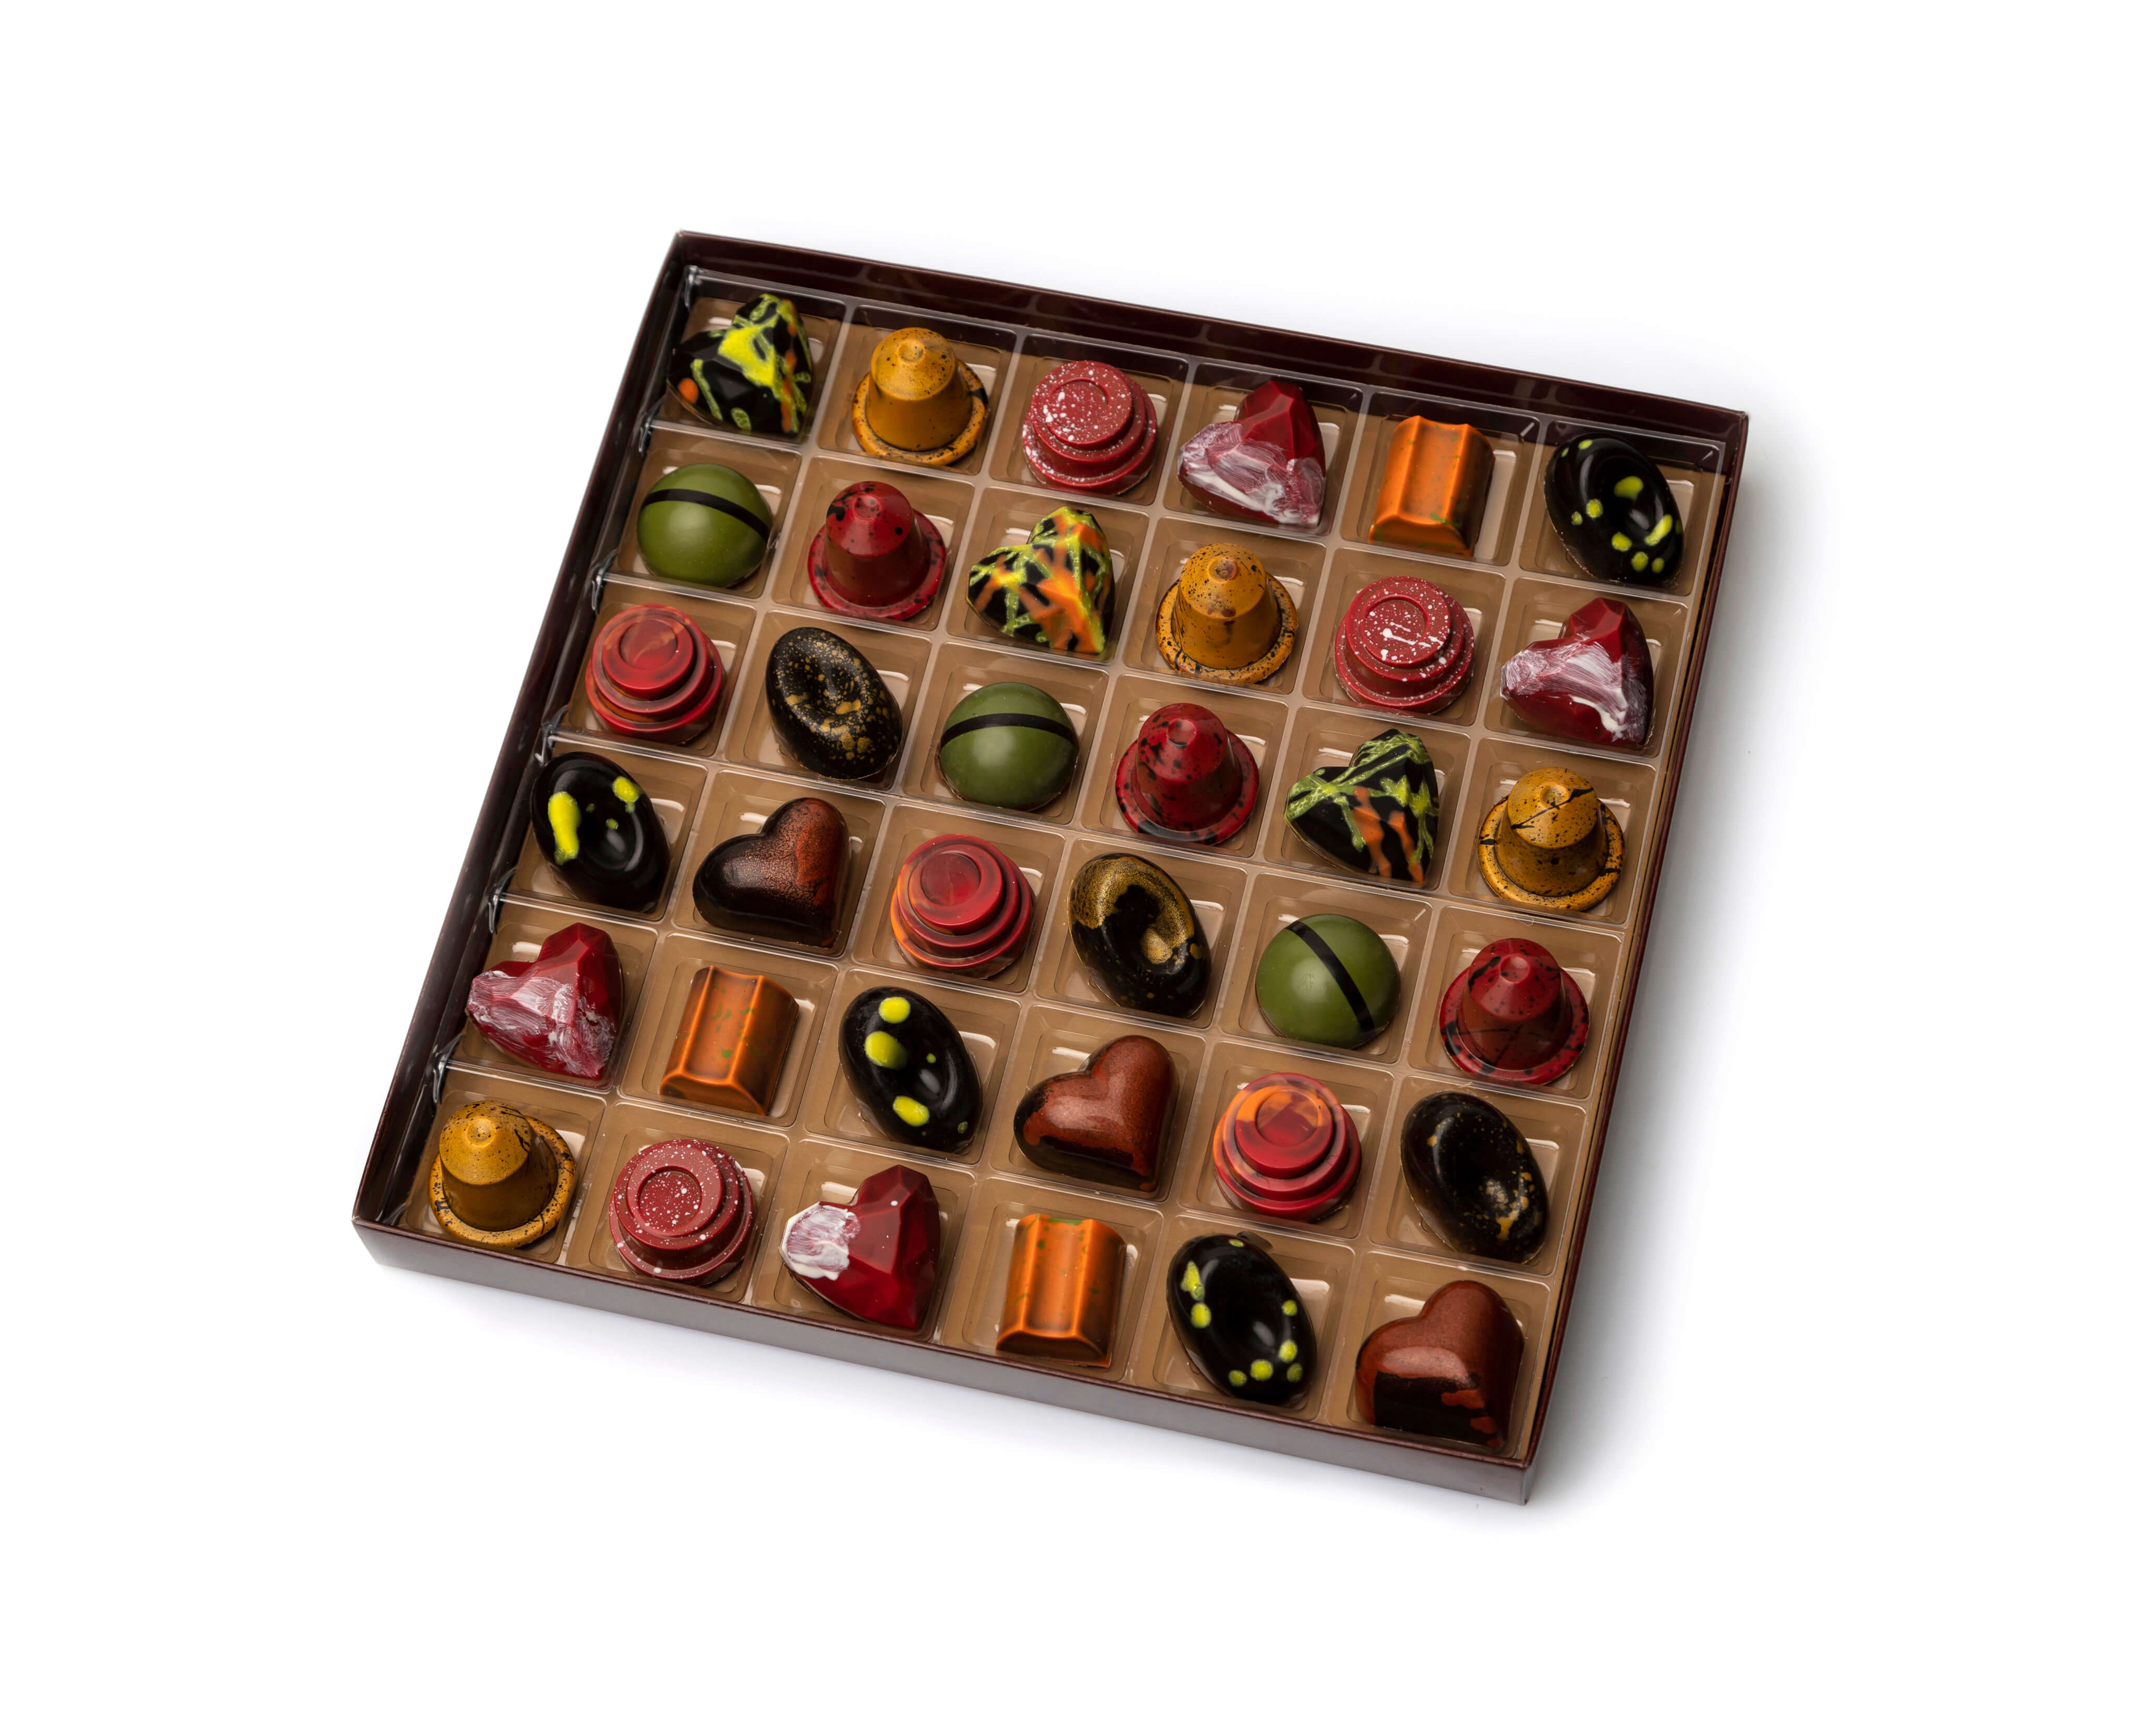 bombones 36 unidadescoruñatrufas de chocolate coruña chocolatería coruña bombones trufas de mandarina cajita musicos